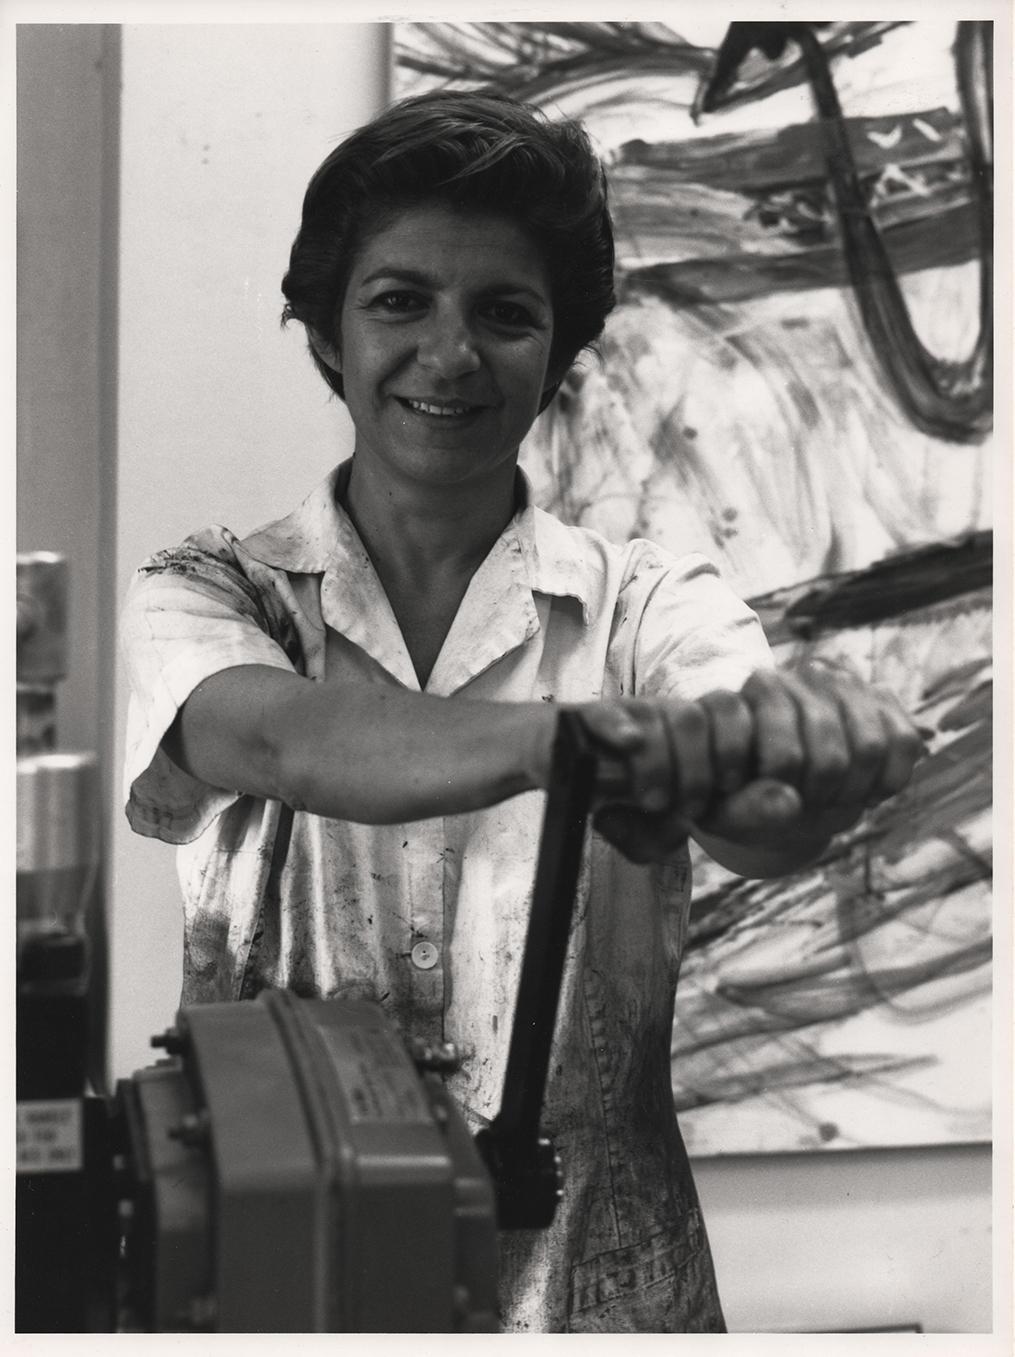 YR-1970s-Working-with-Etching-Press 1024x1357px.jpg